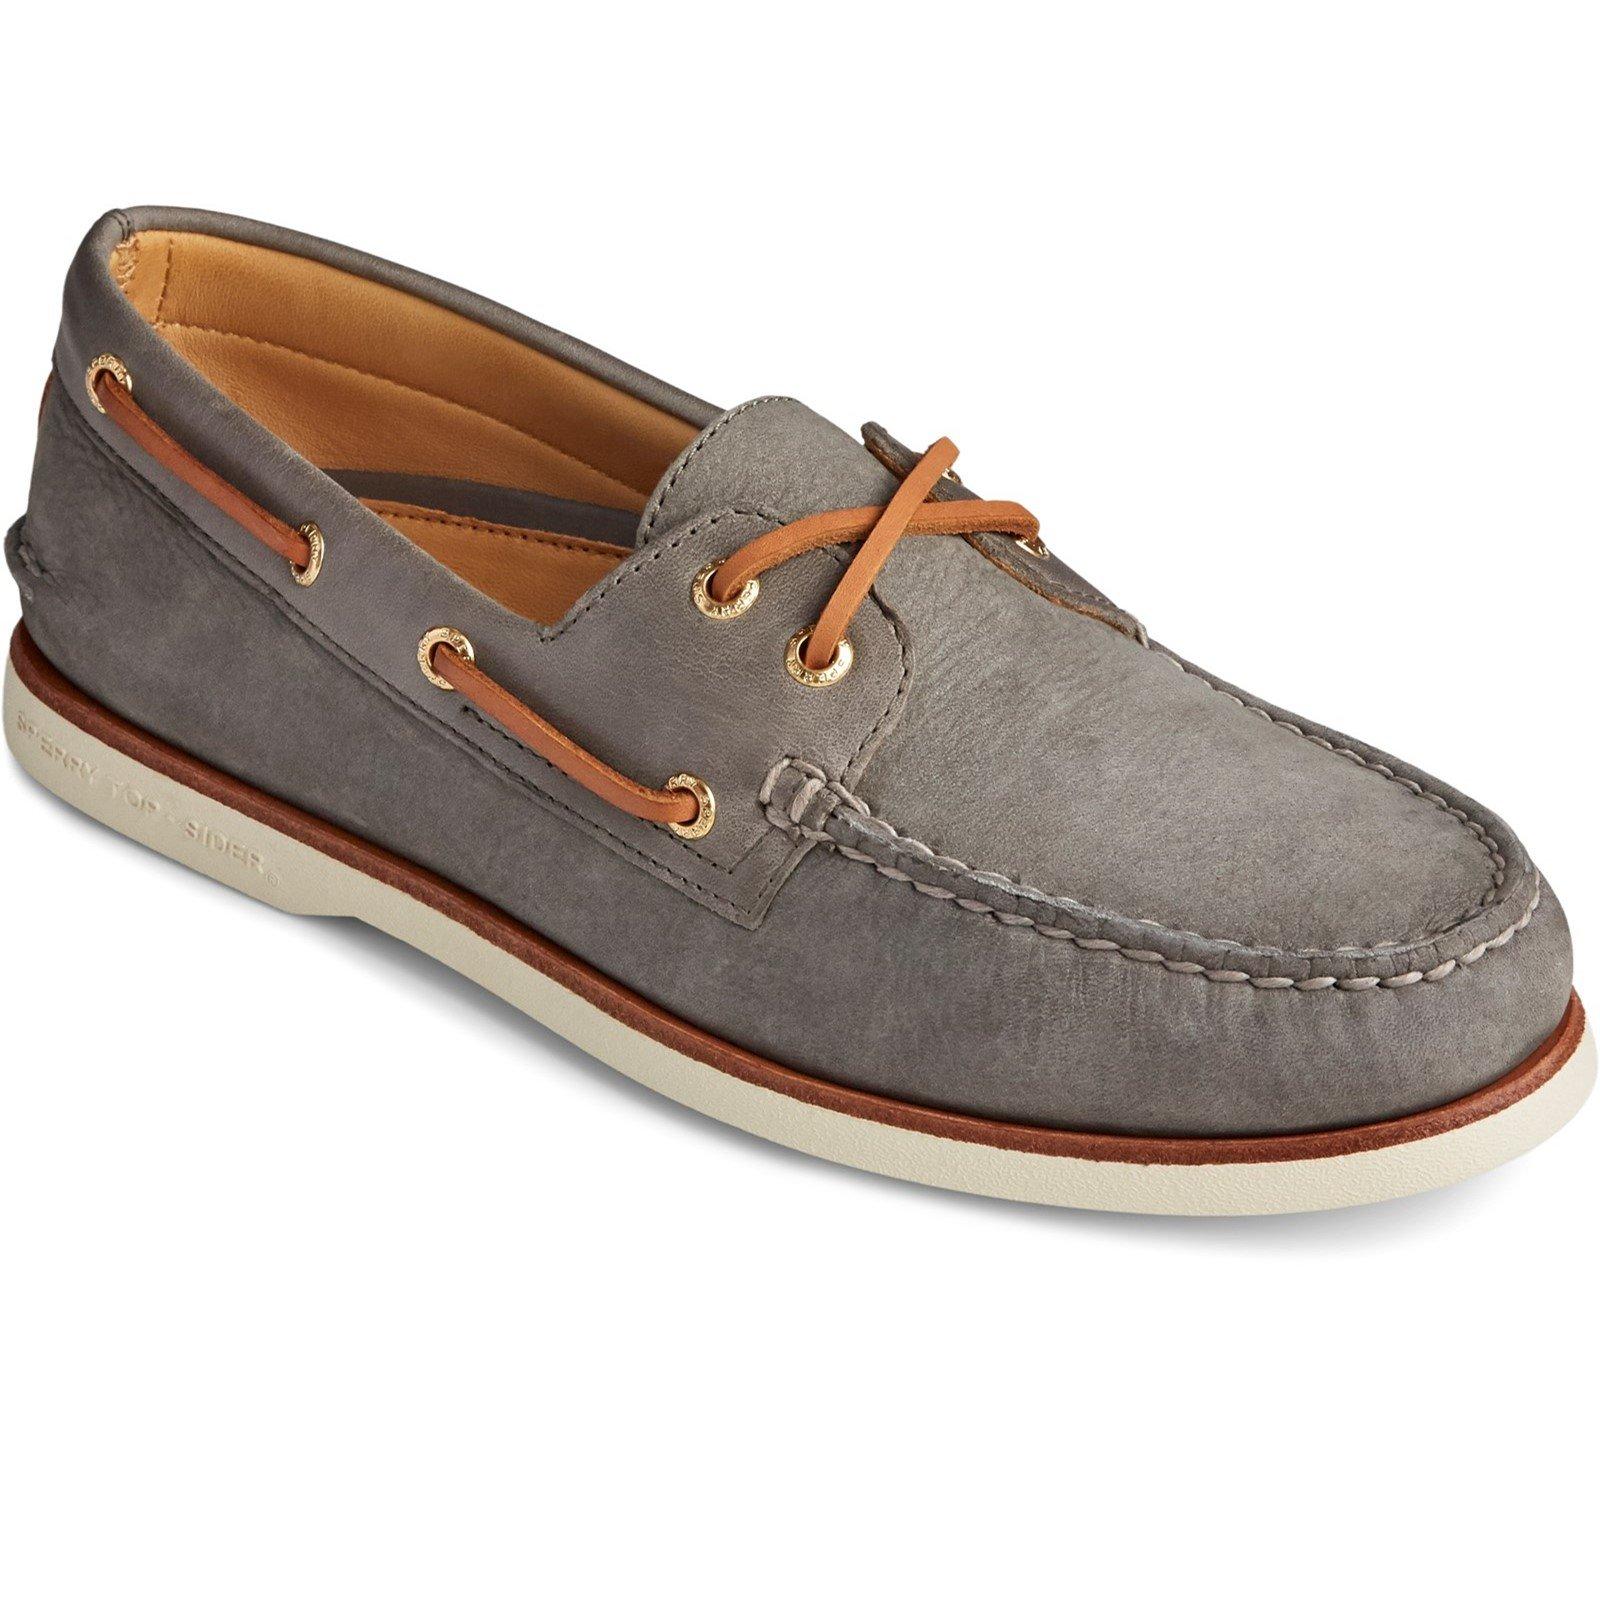 Sperry Men's Authentic Original Seaside Boat Shoe Grey 31529 - Grey 10